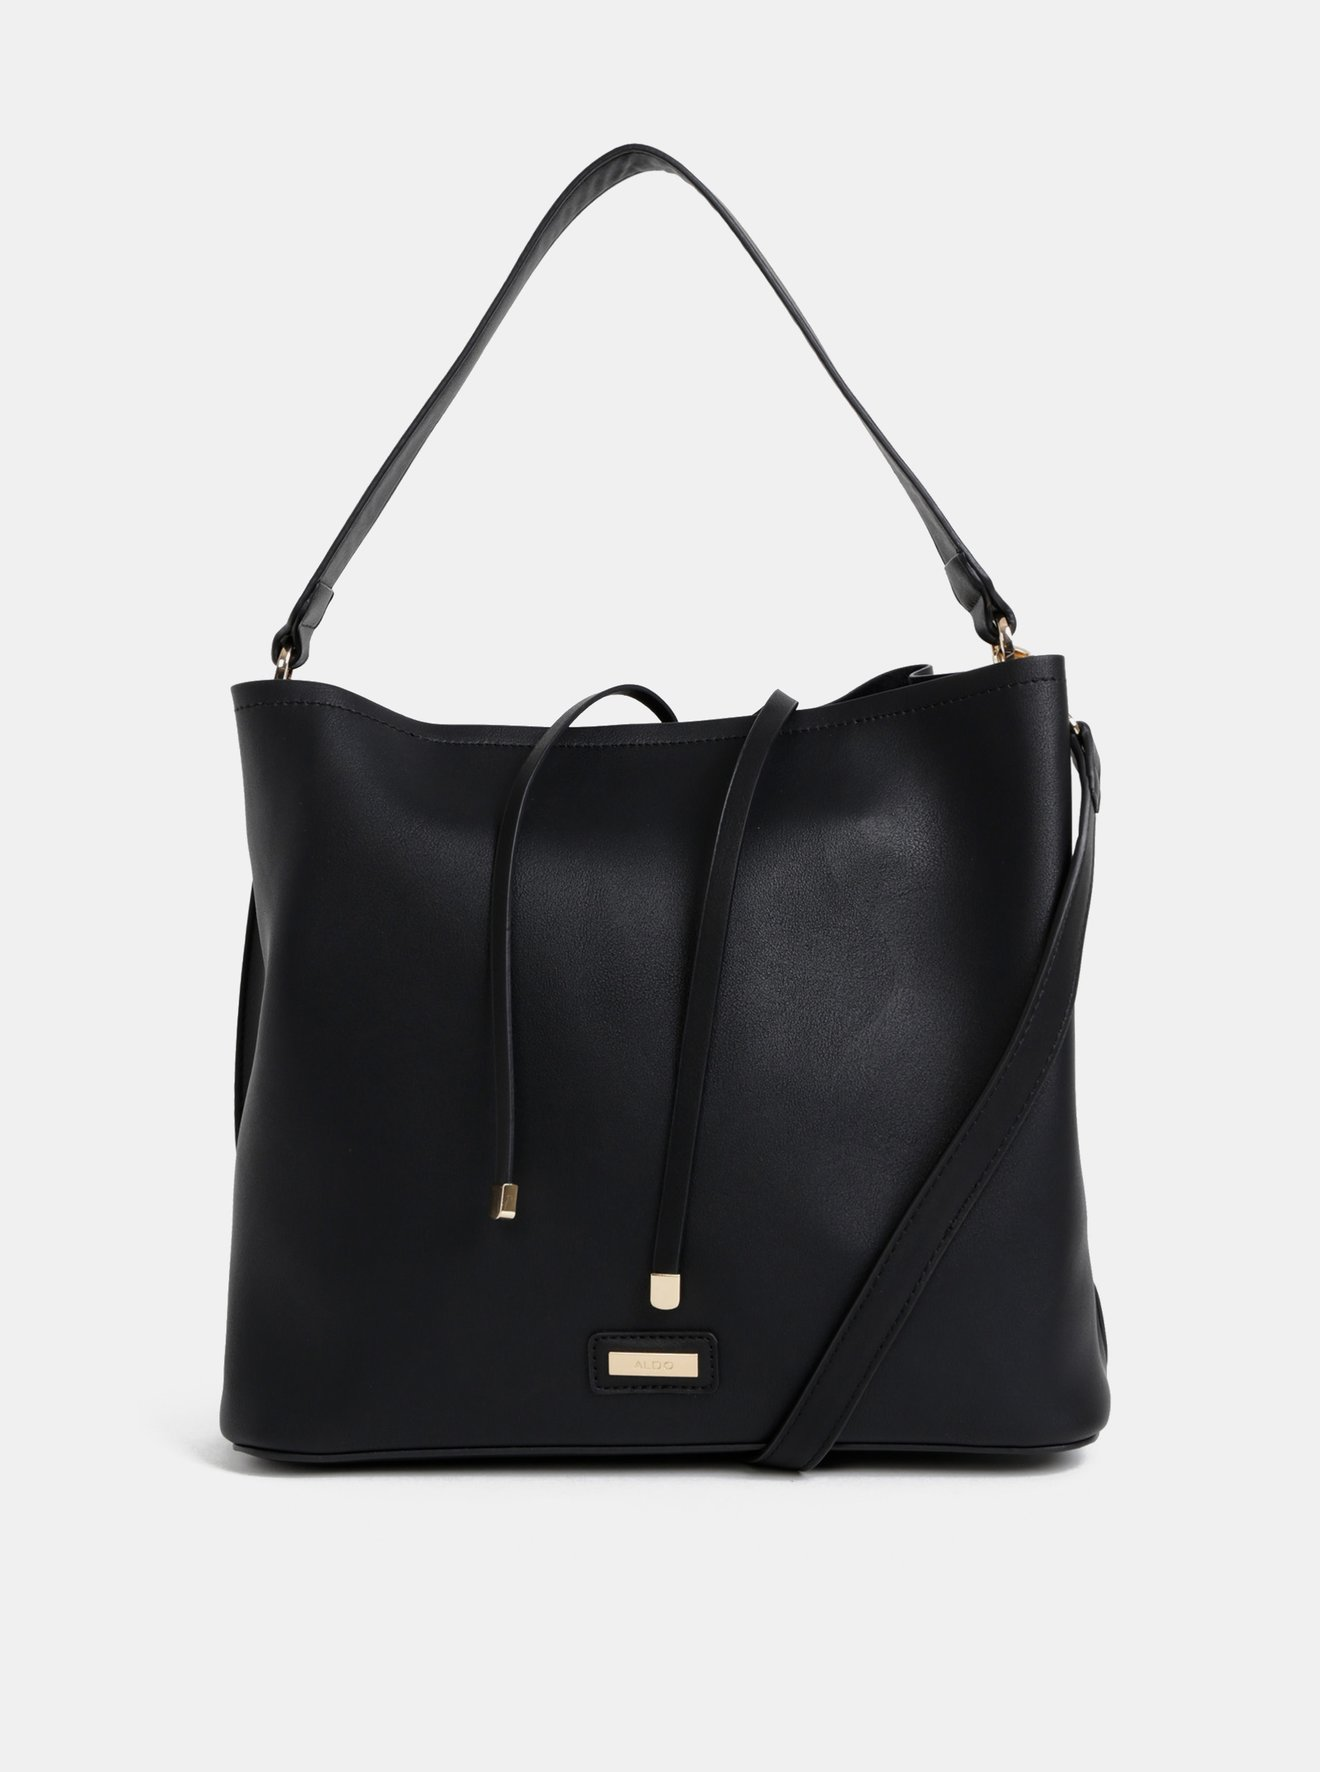 Černá kabelka ALDO Vignoleborbera